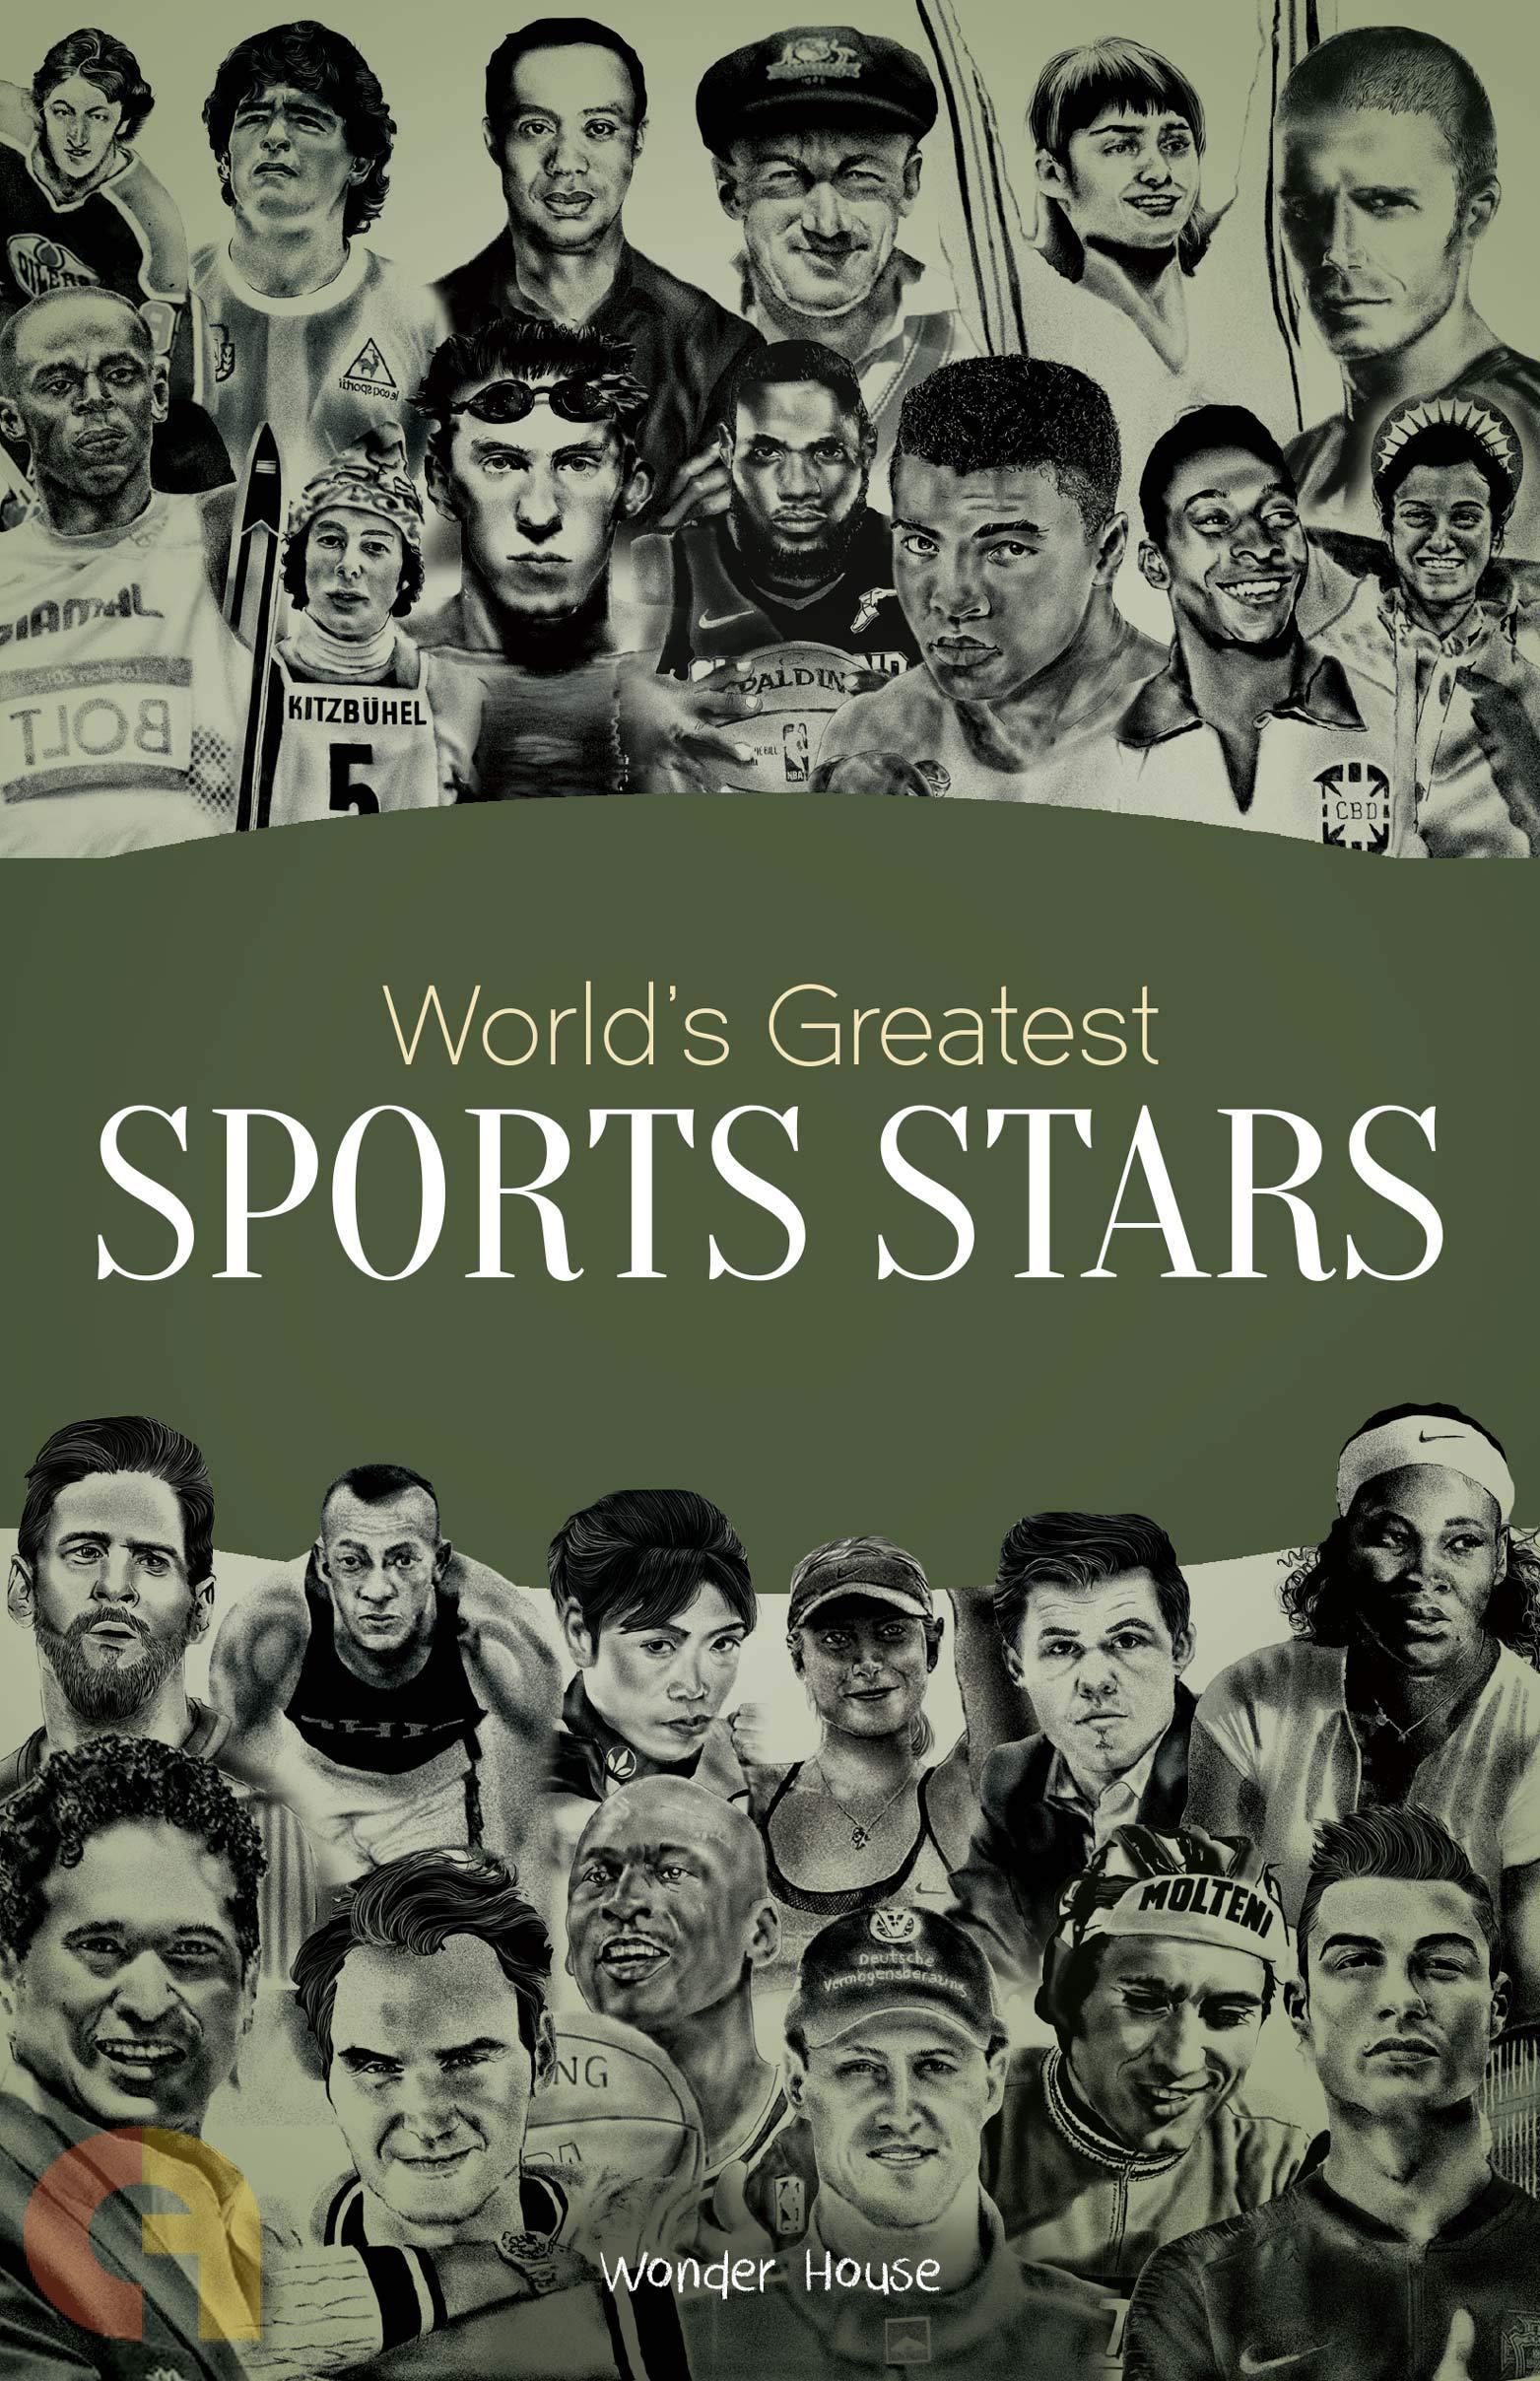 World's Greatest Sports Stars